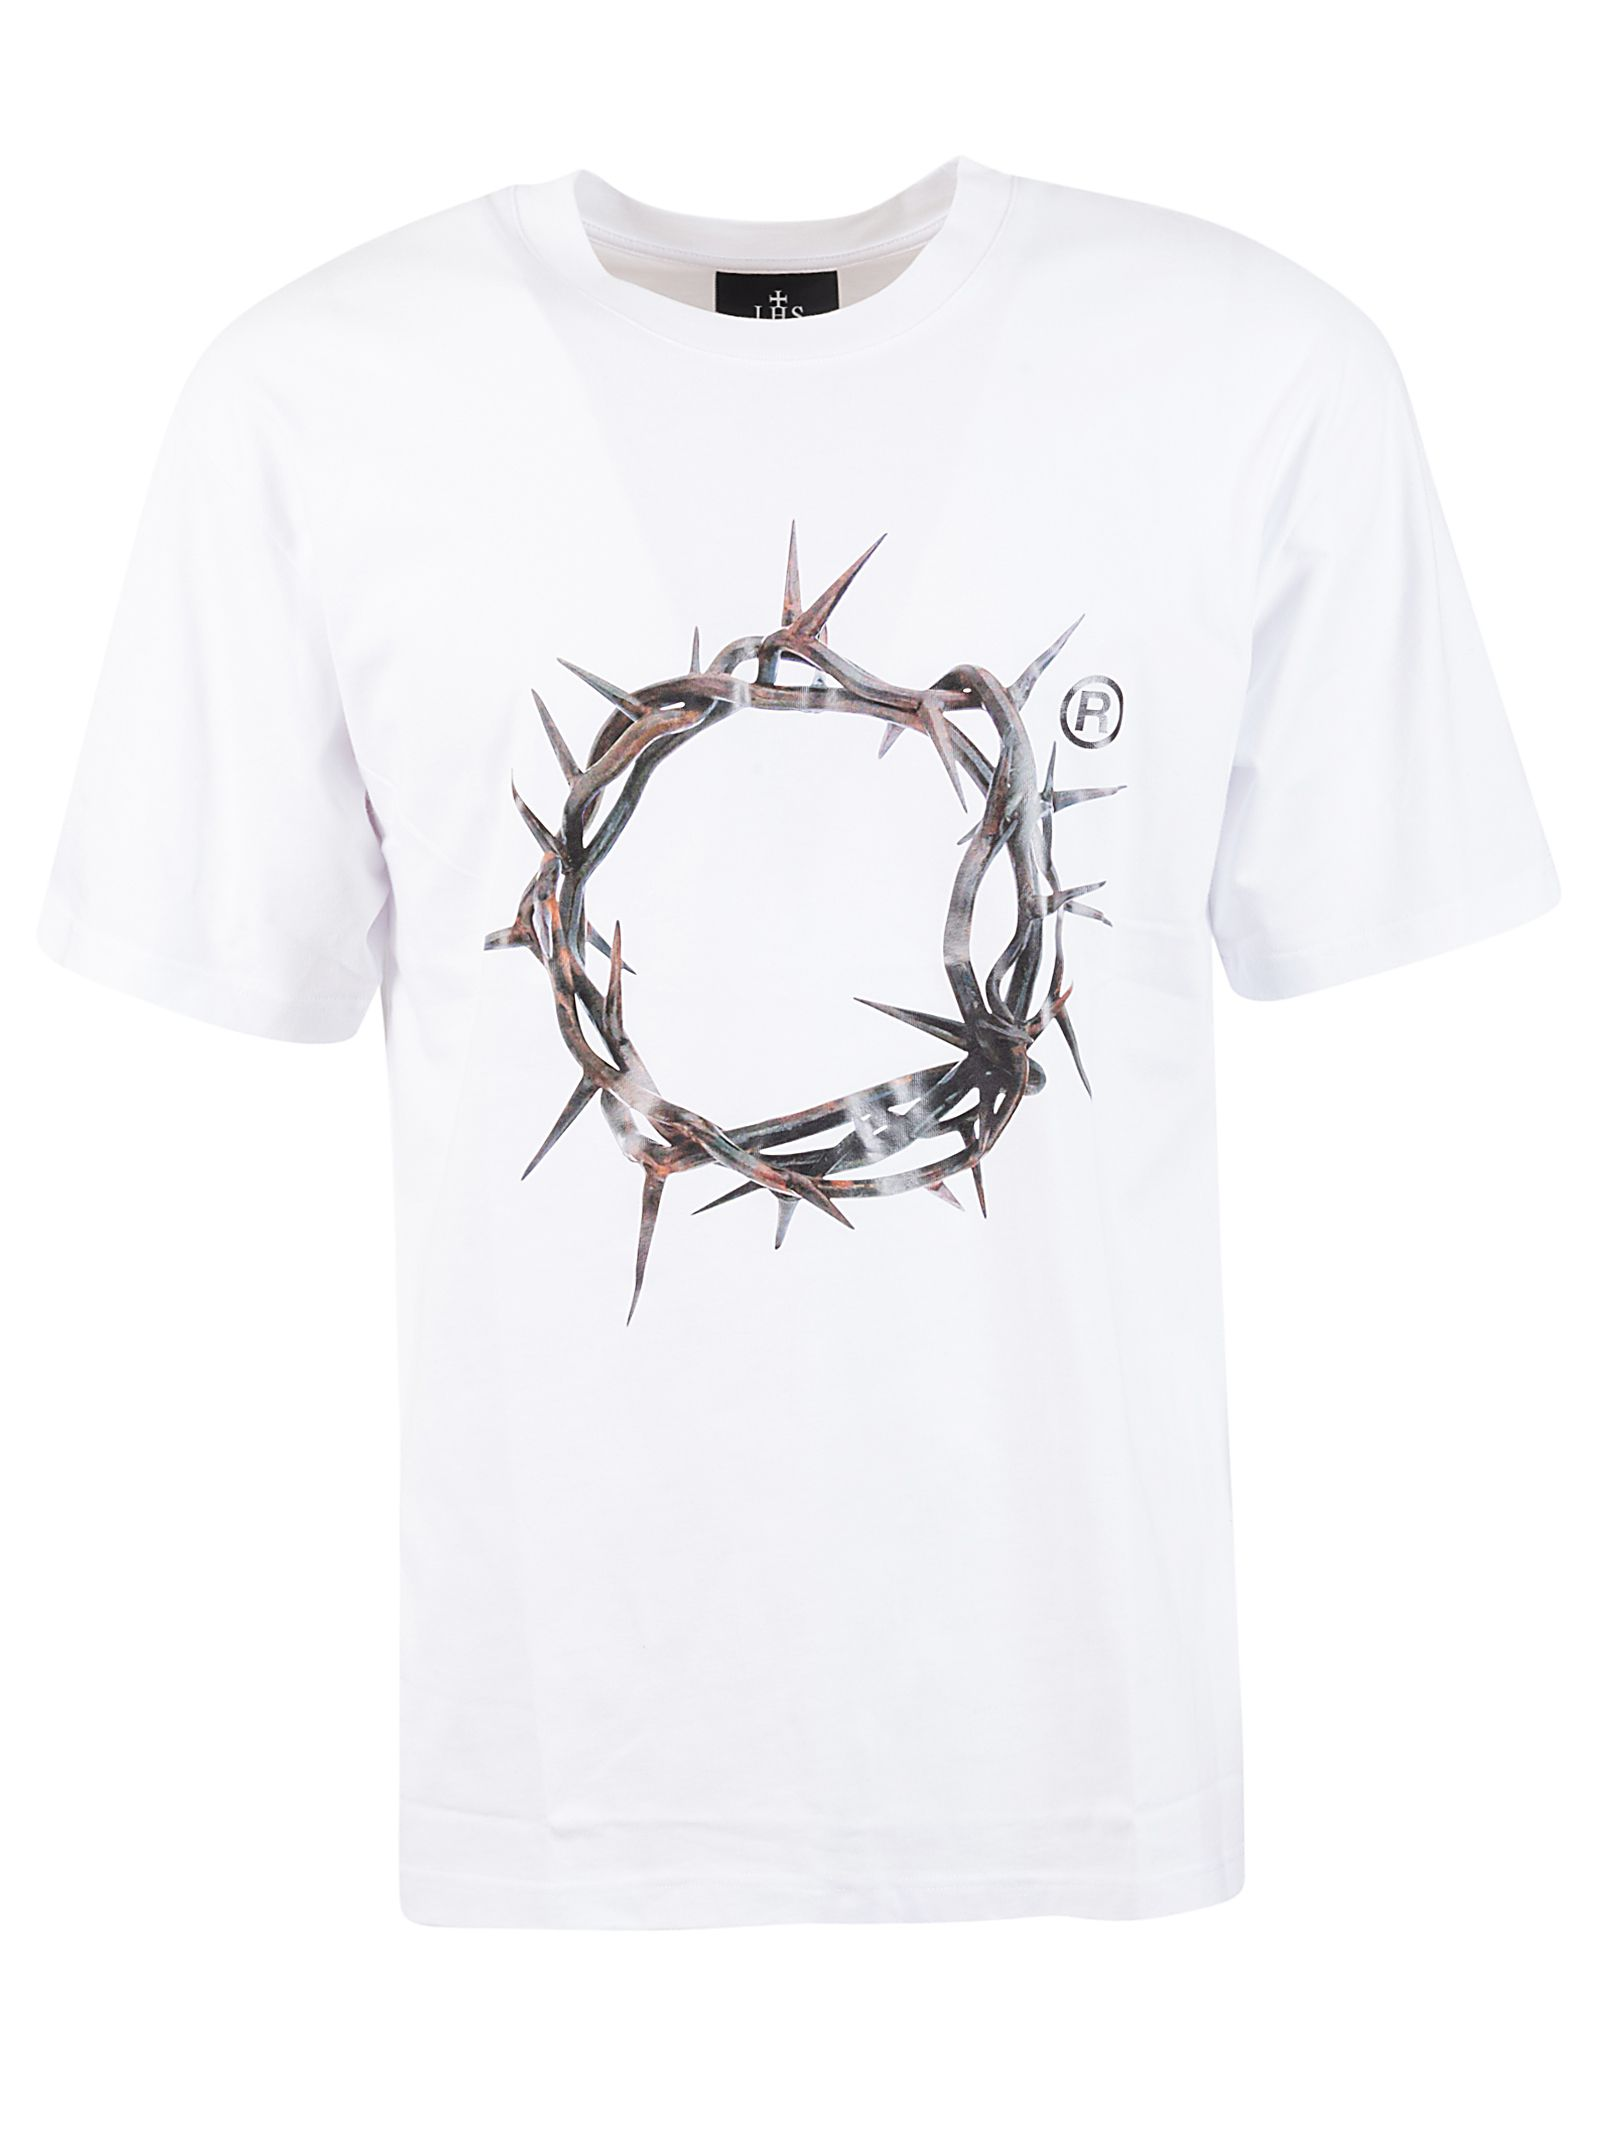 Ihs White Cotton T-shirt